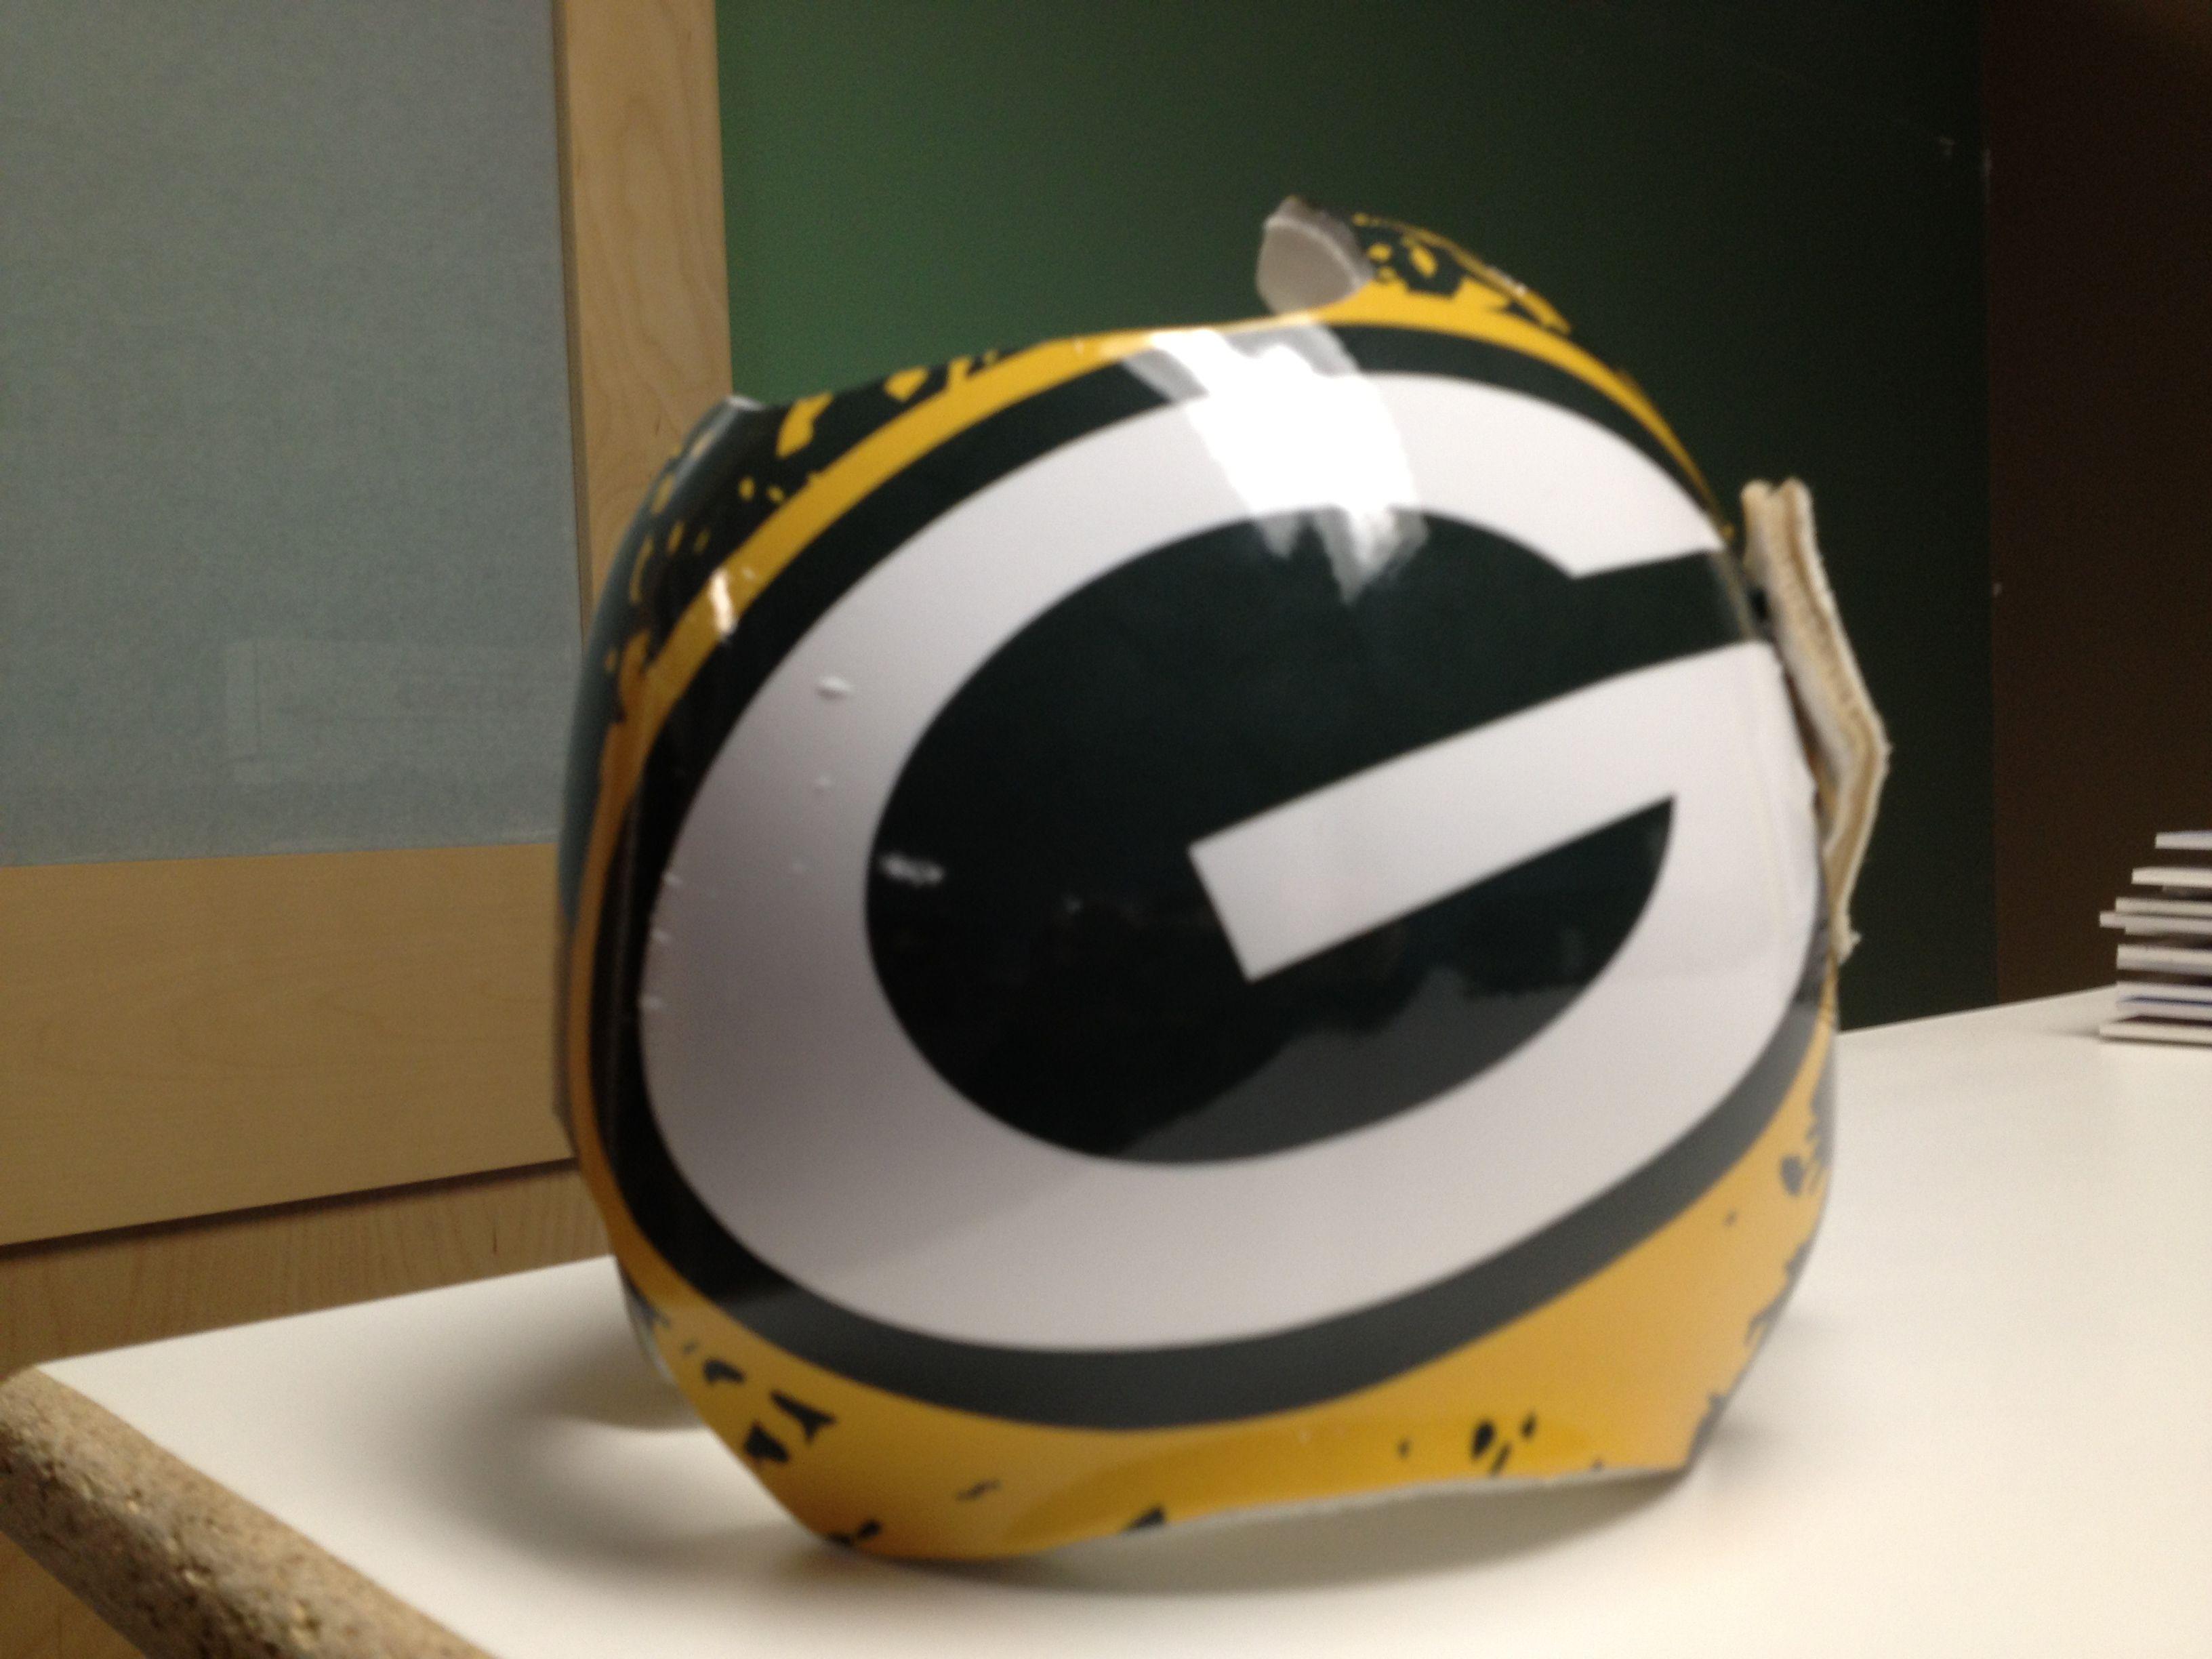 7bb332f7 www.kidwraps.org Packers DOC Band Wrap   Kid Wraps by Monarch   Doc ...